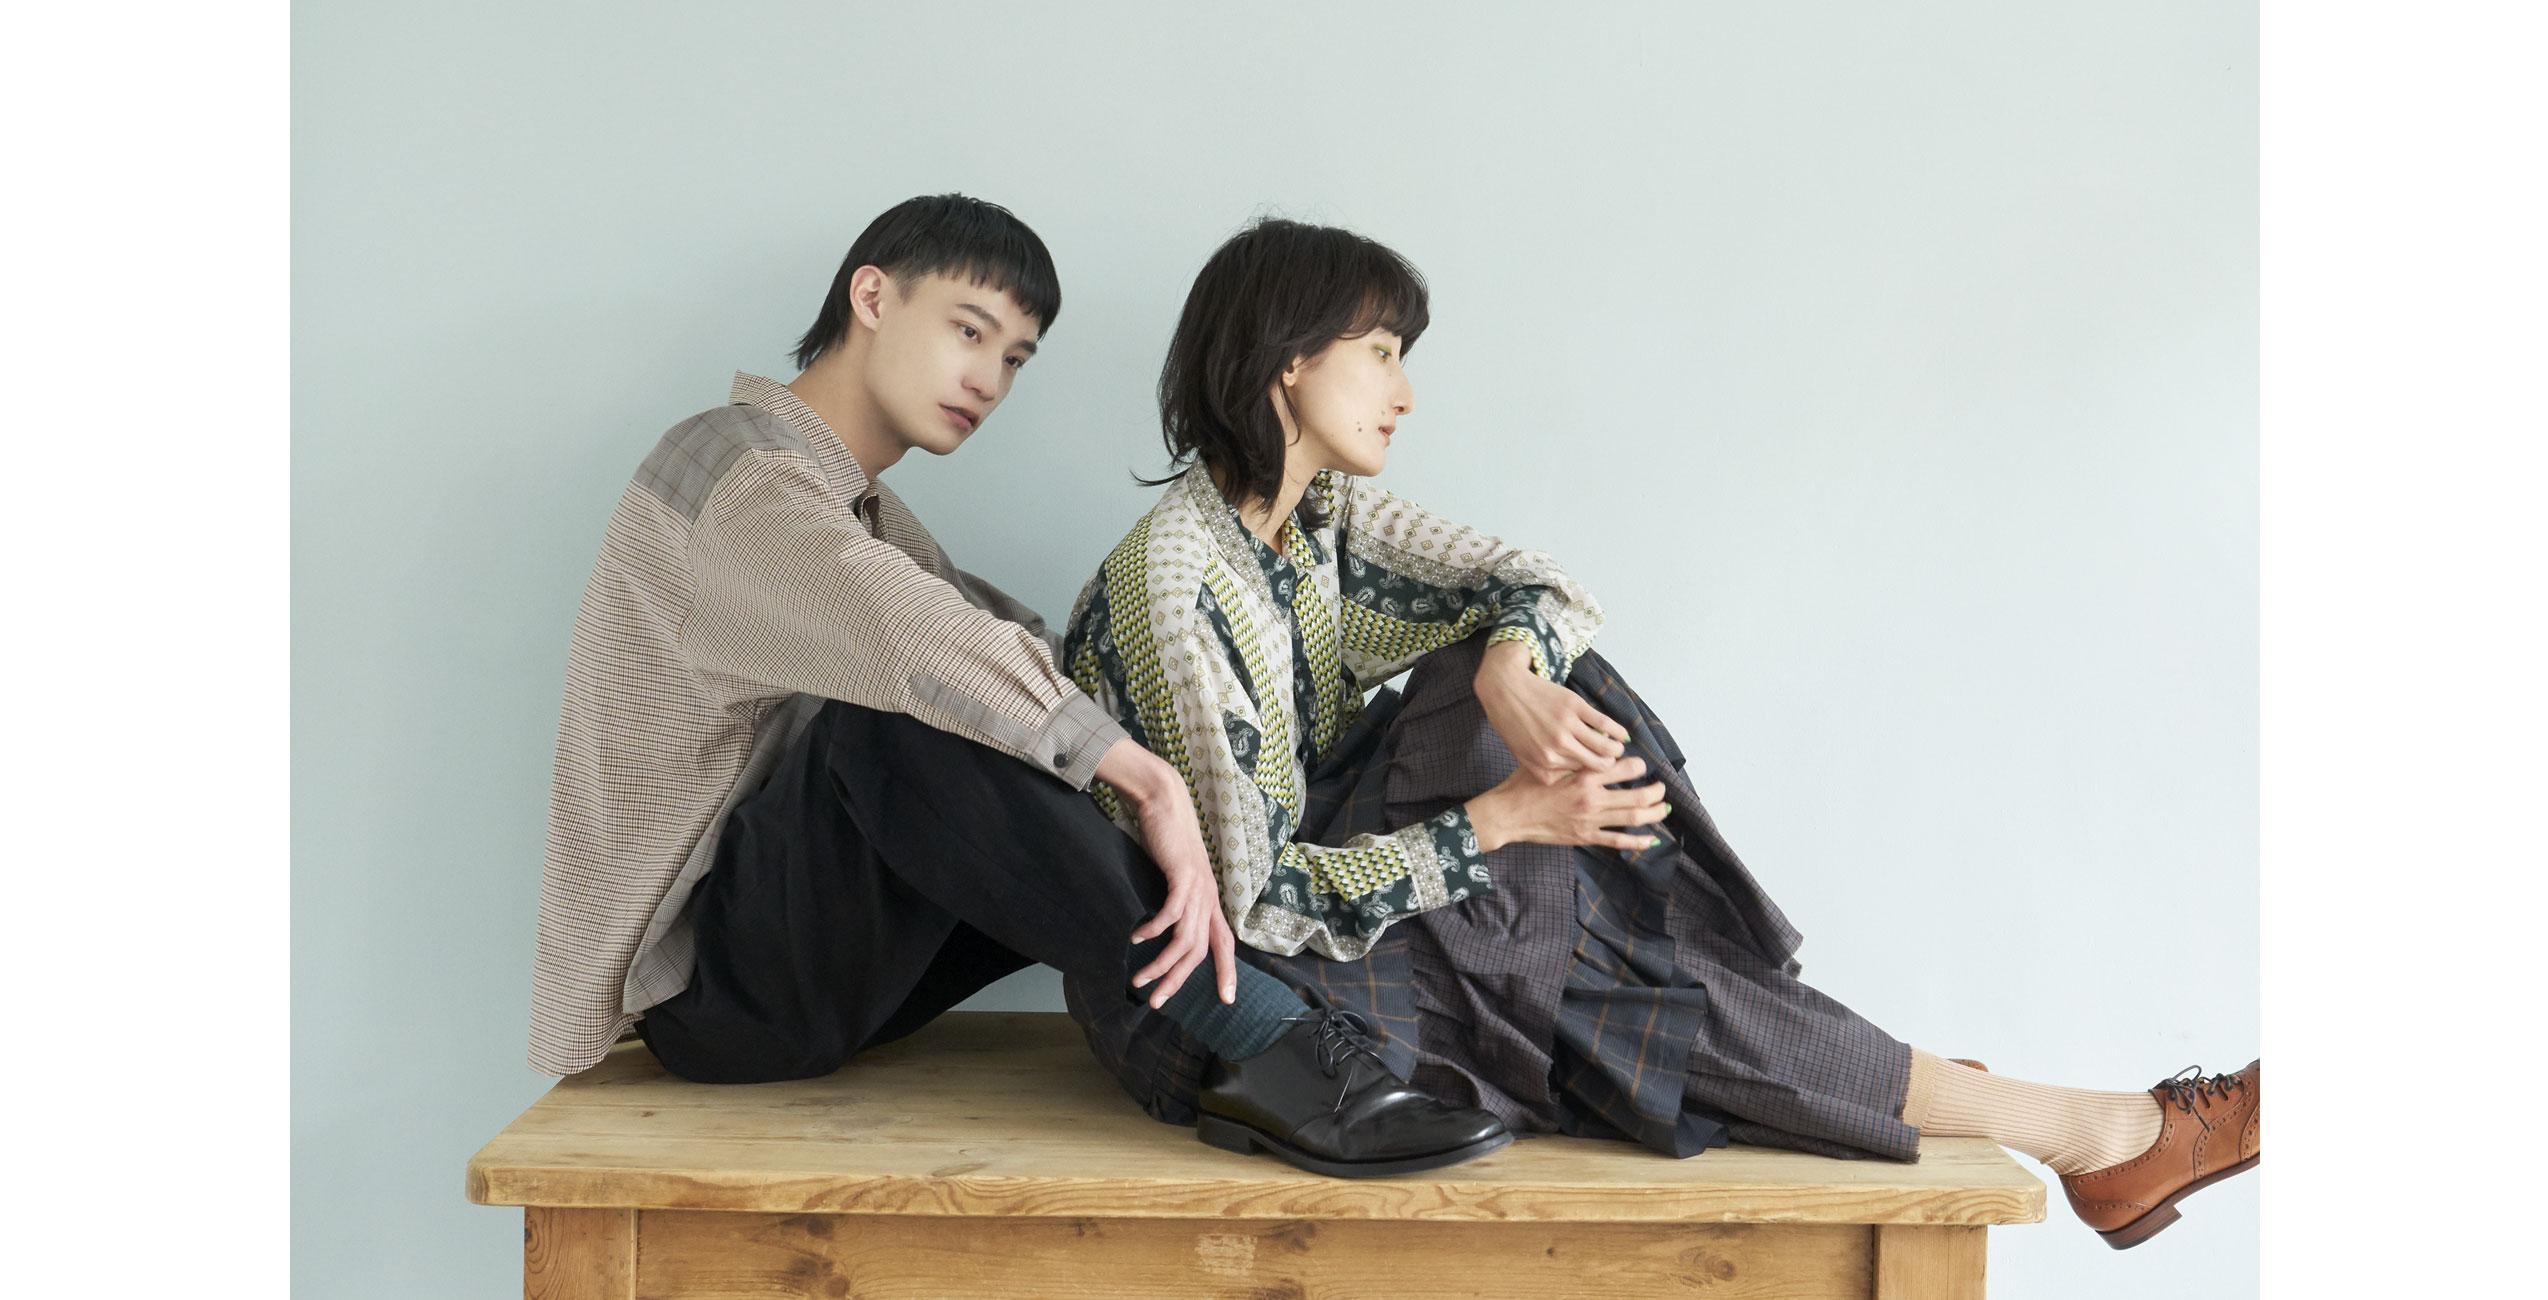 YUKI 2021 Autumn and Winter Collection